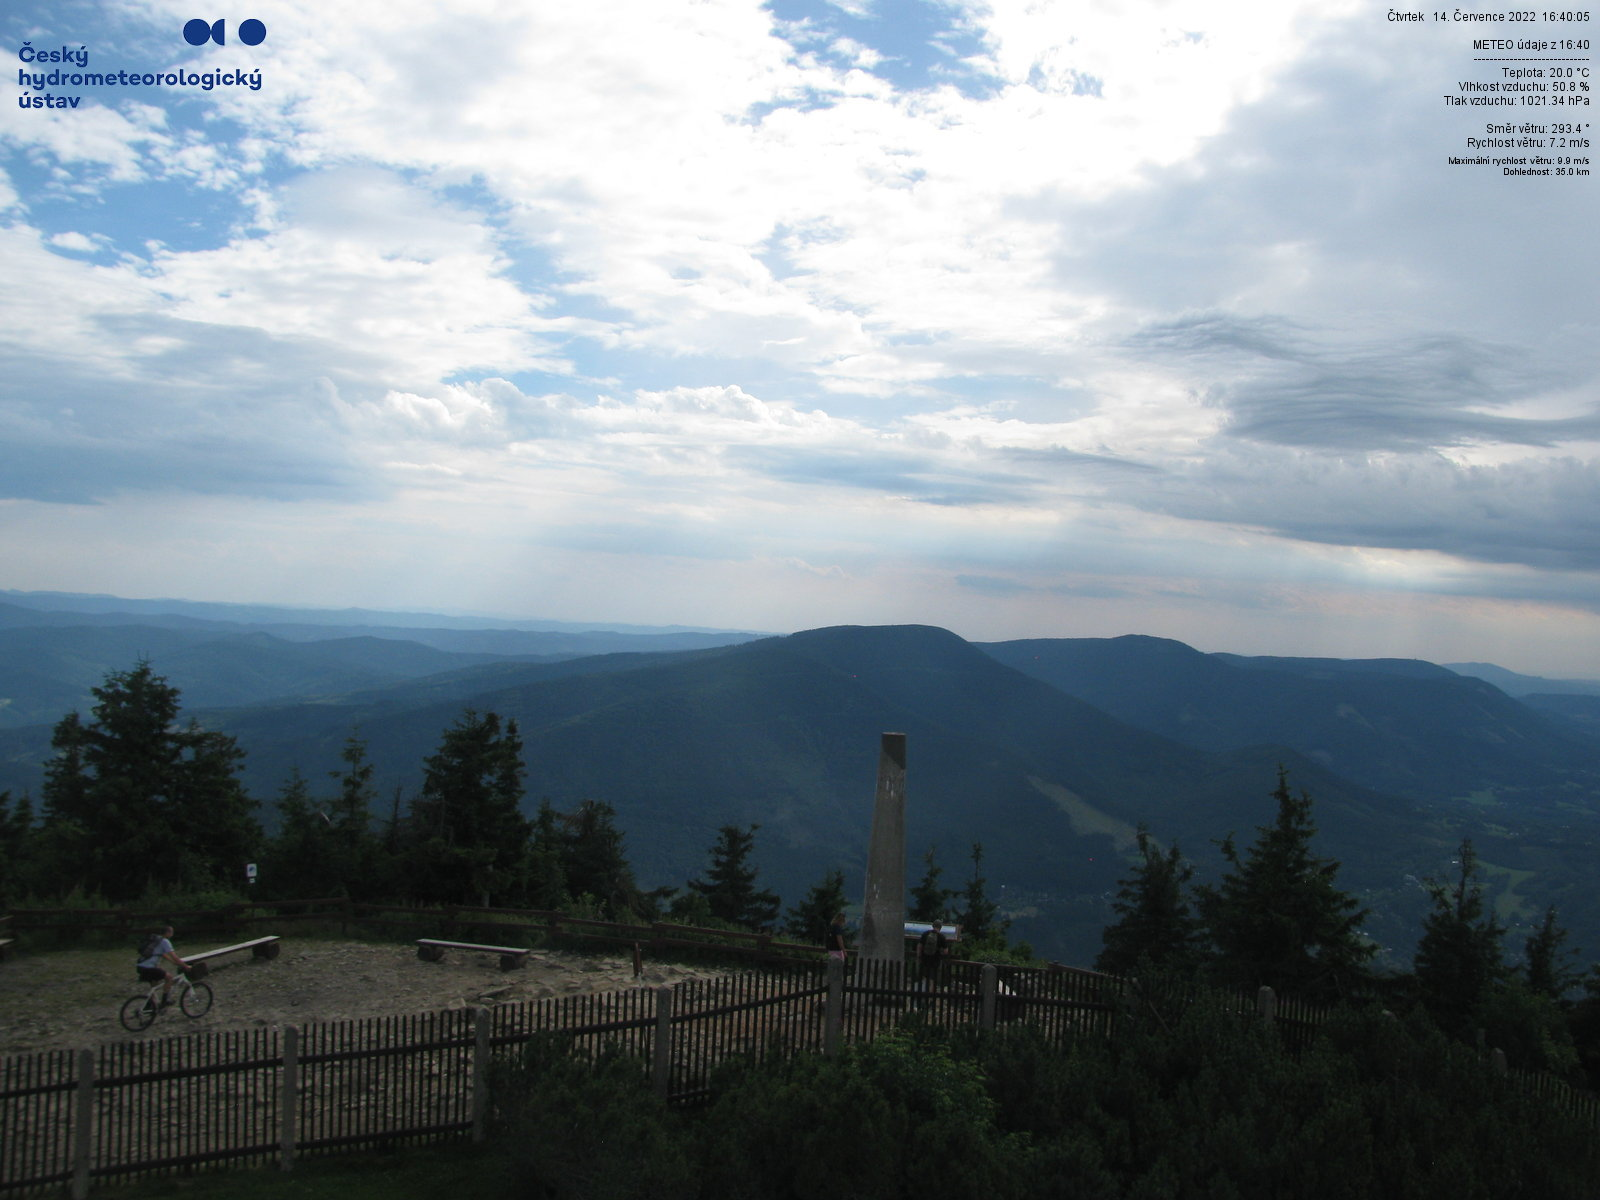 webkamera - Beskydy - Lysá hora (pohled na jihozápad